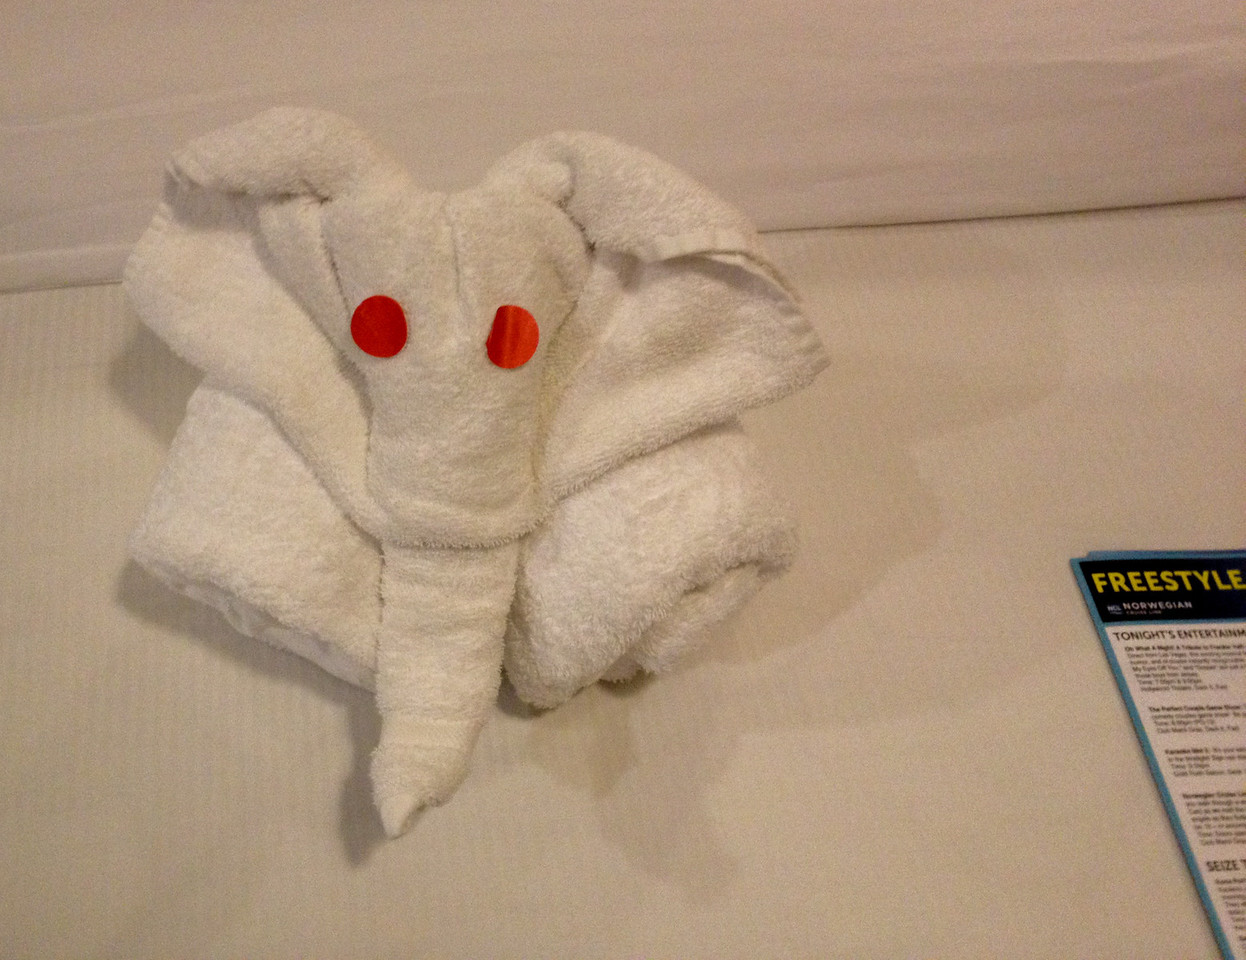 Day 3 elephant towel art